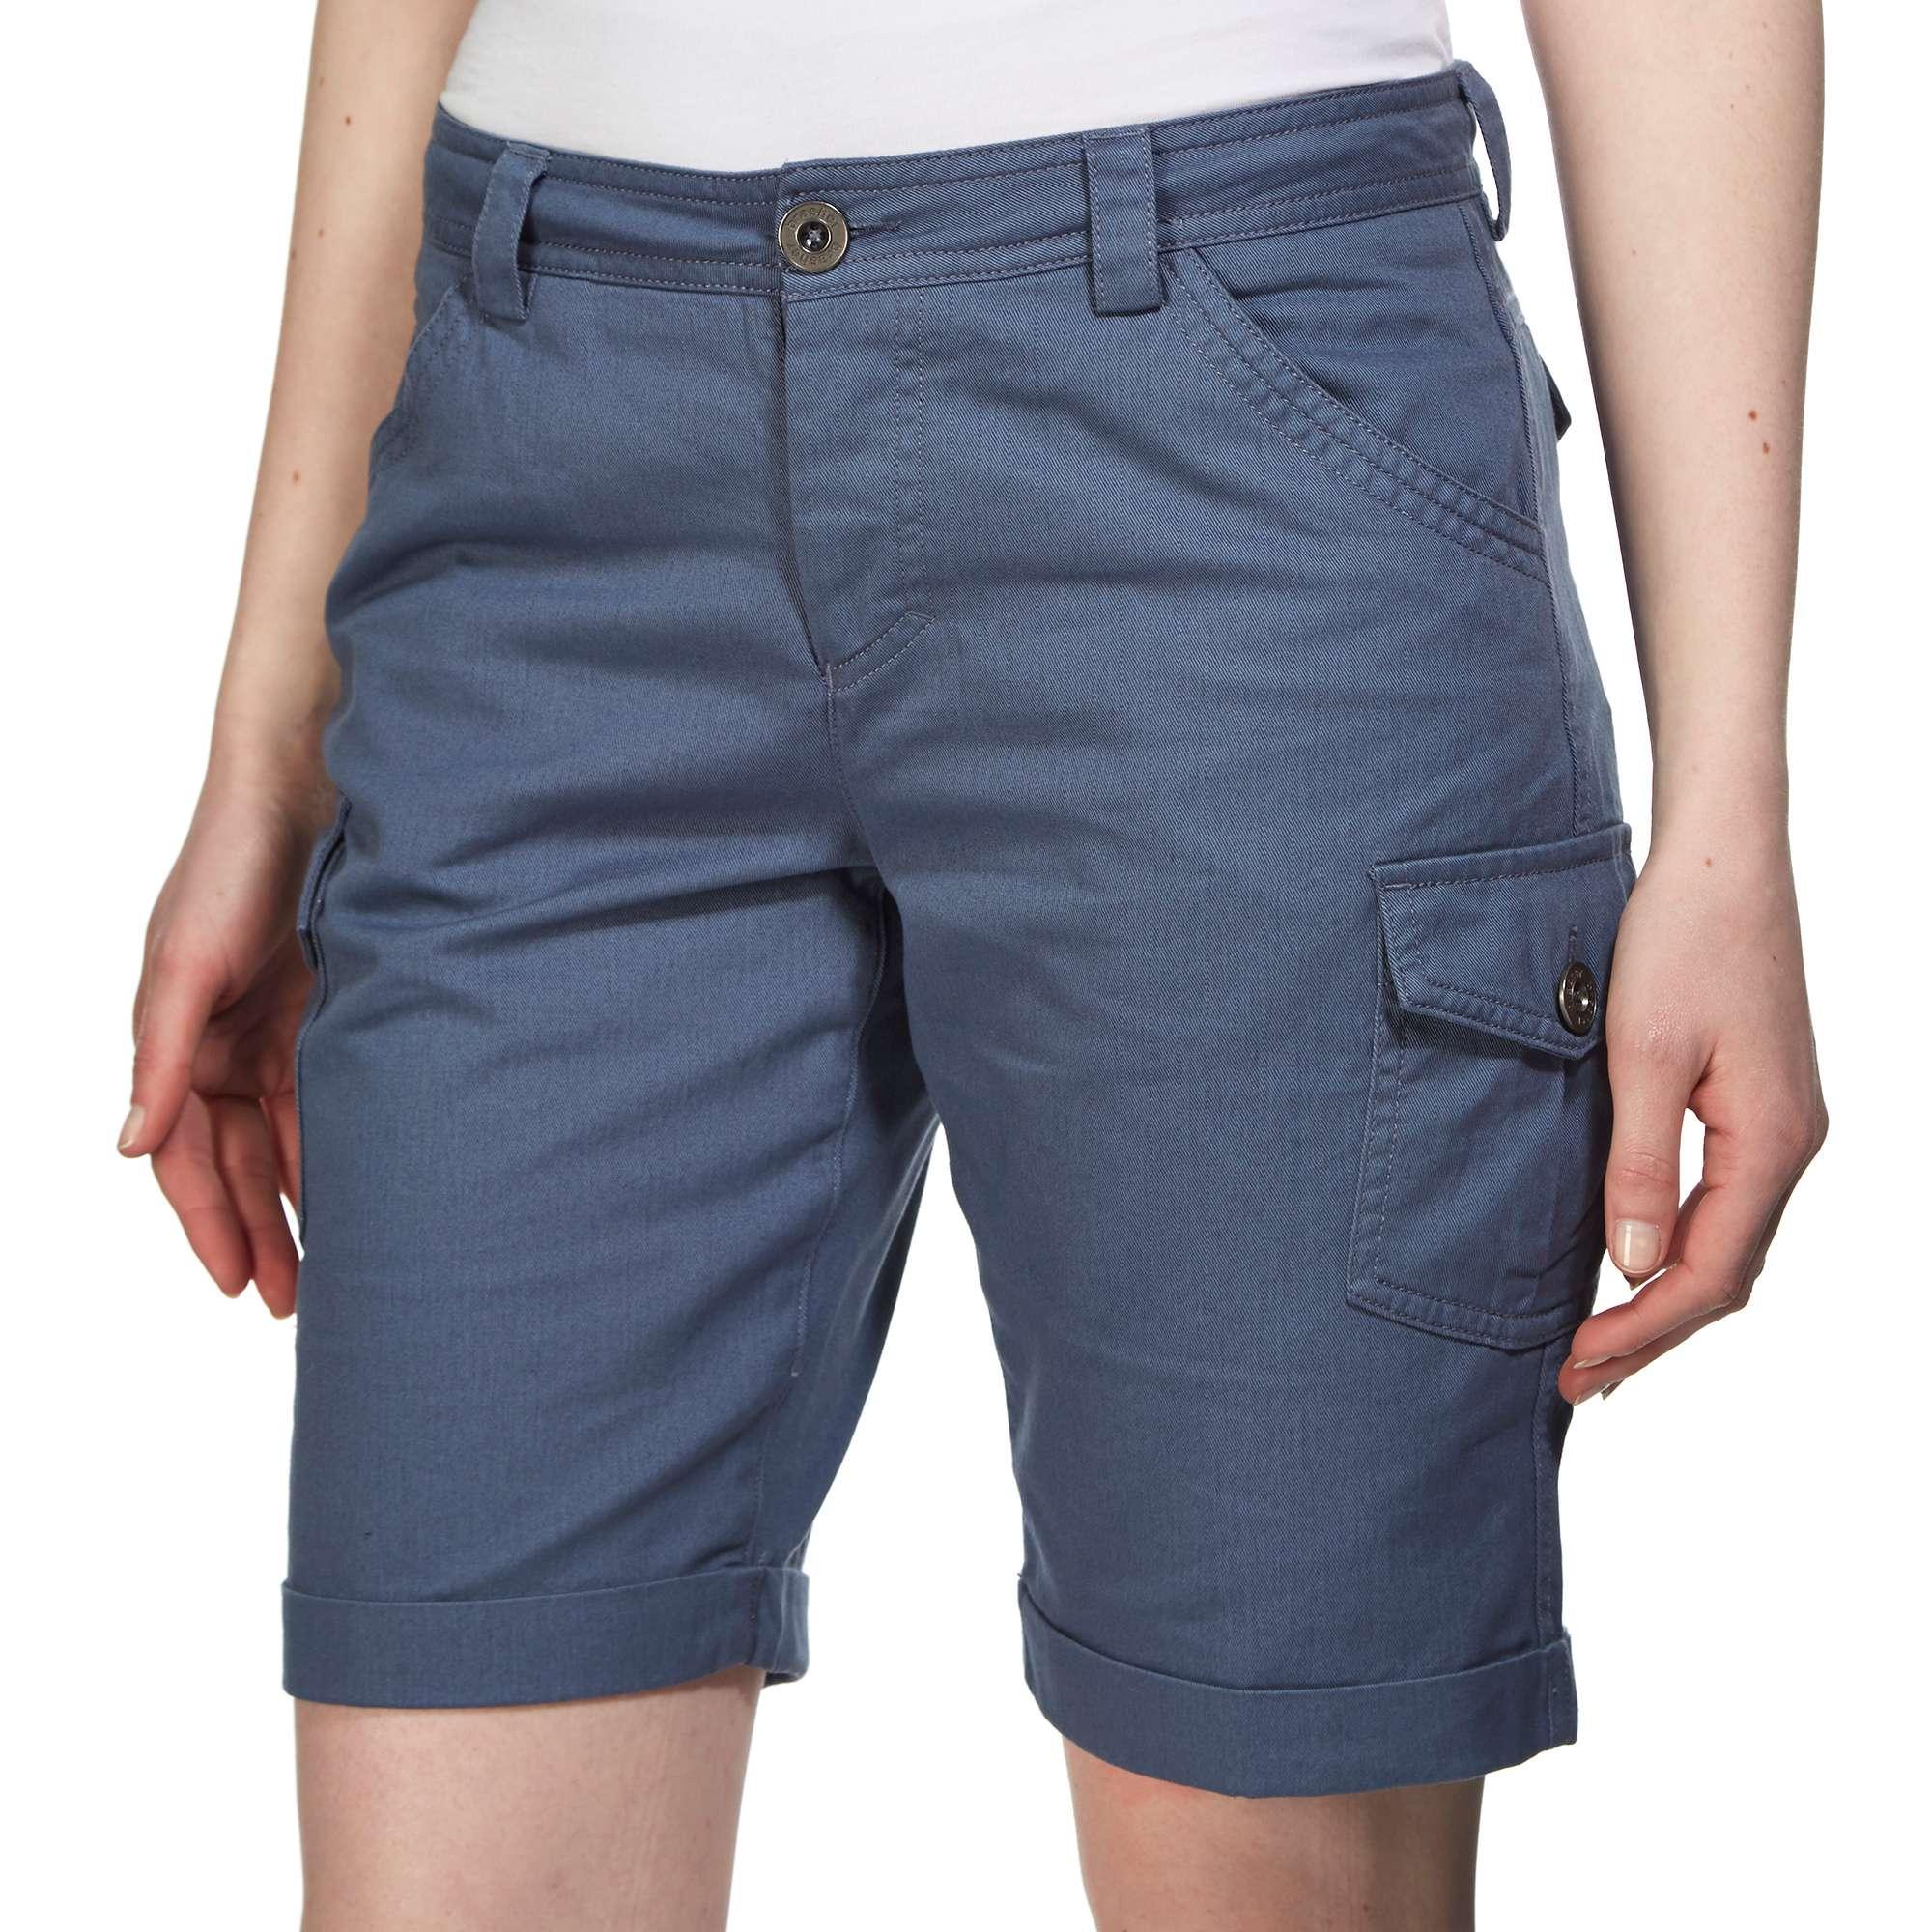 BRASHER Women's Crag Hill Cargo Shorts